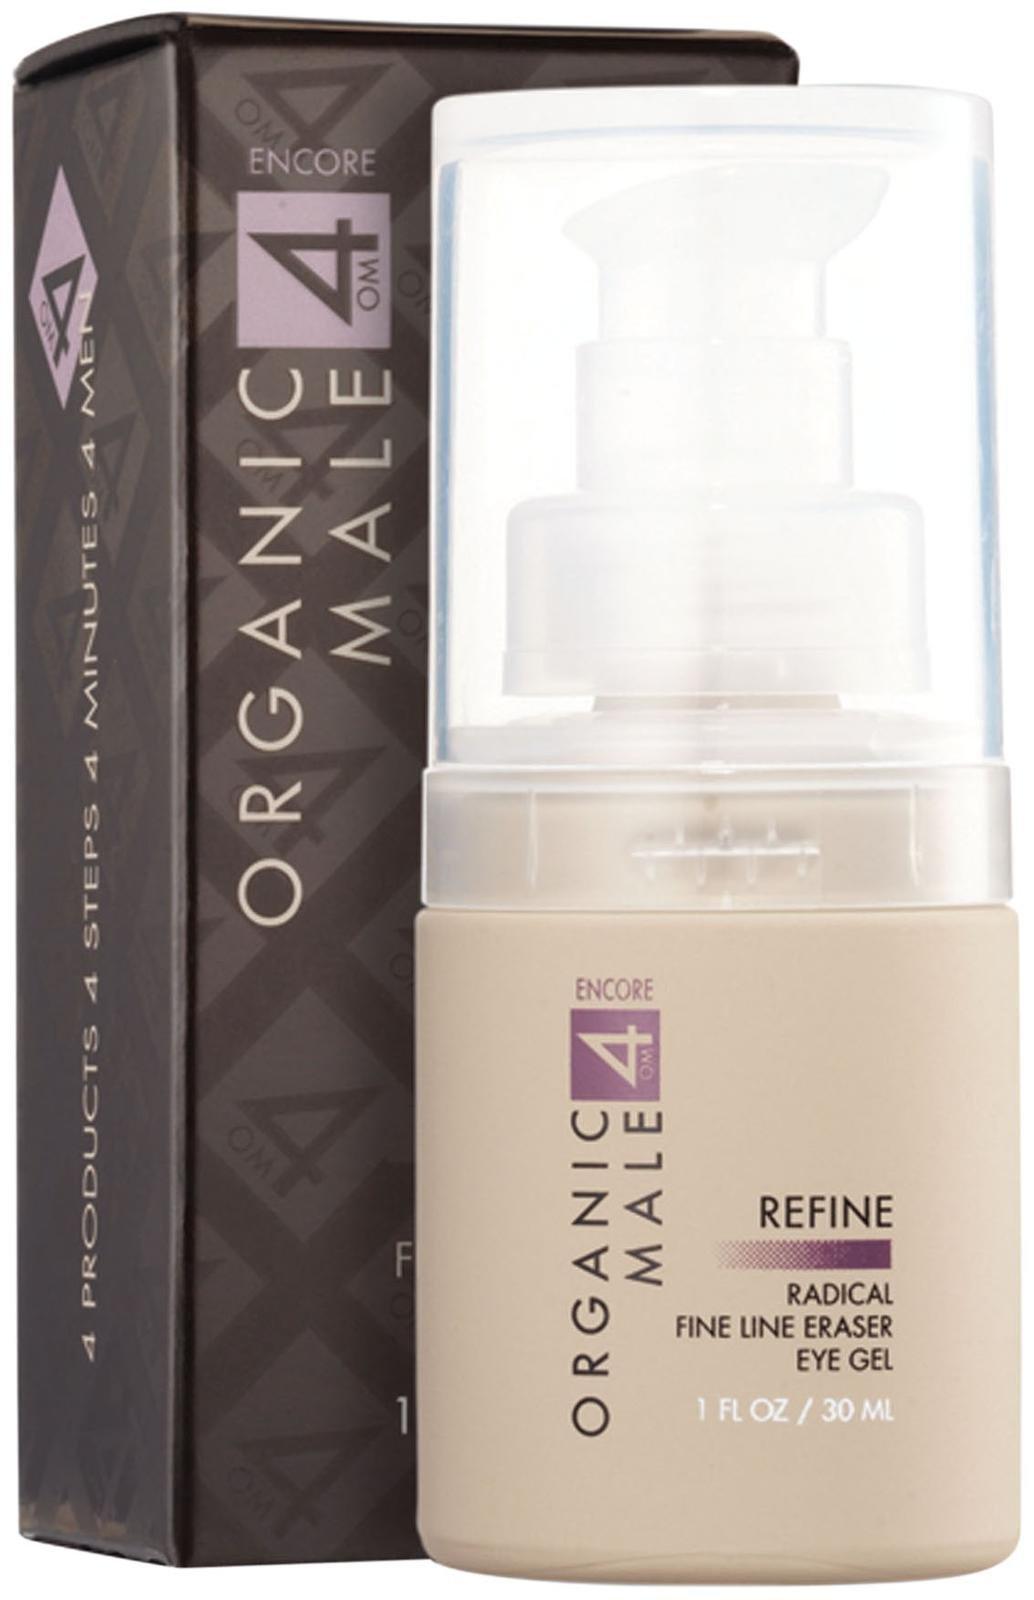 Organic Male OM4 Encore REFINE: Radical Fine Line Eraser - 1 oz